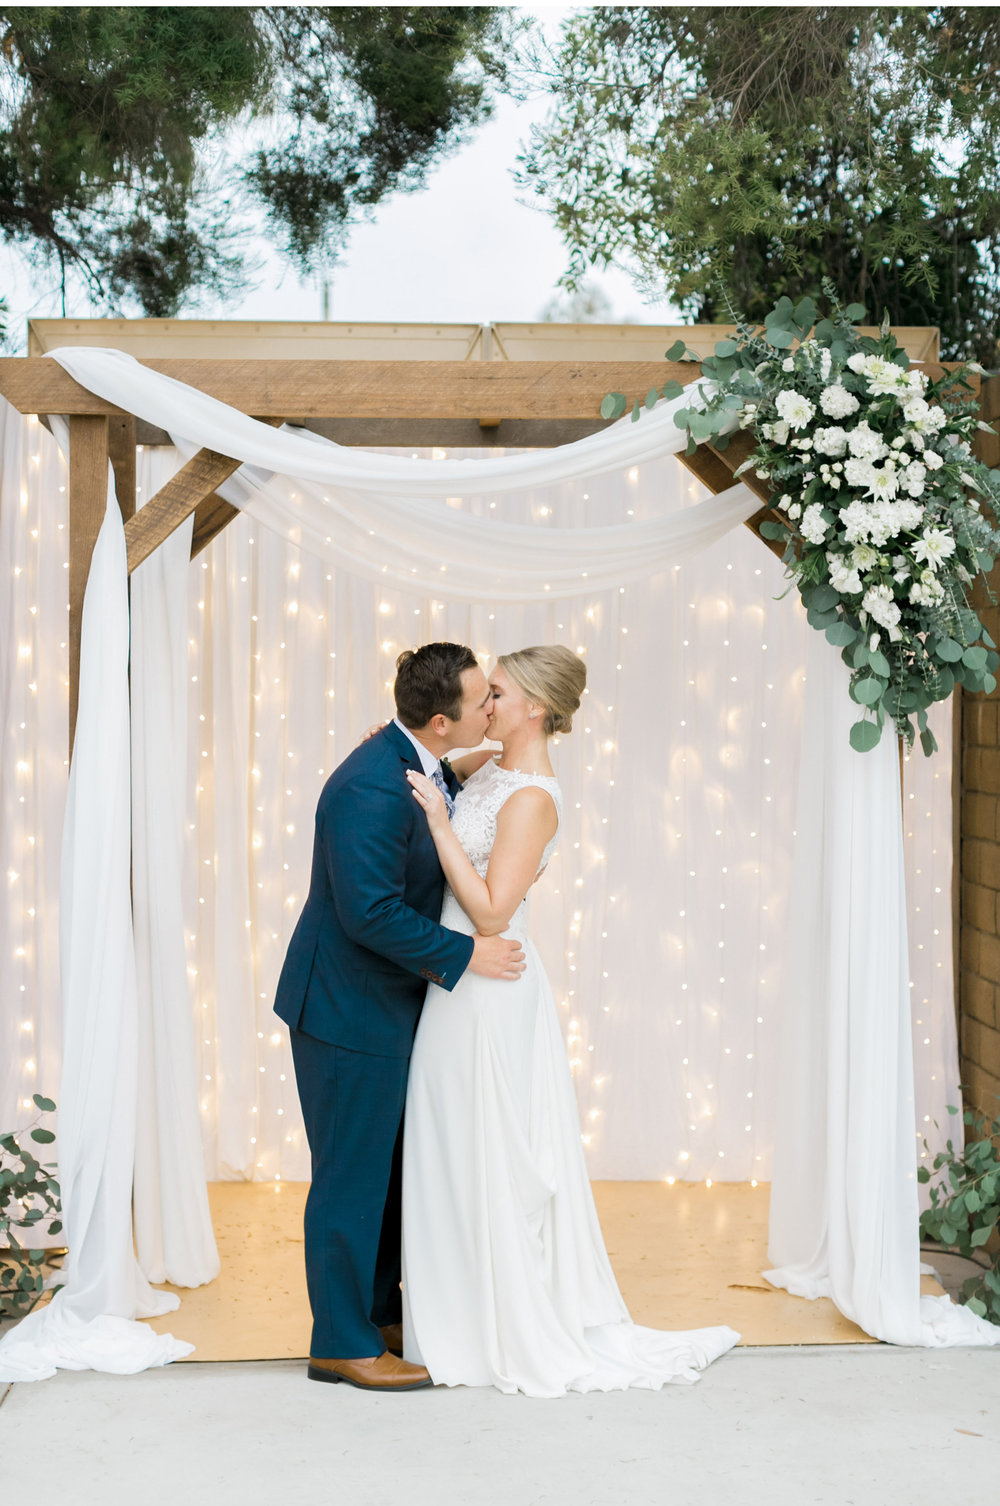 Malibu-Wedding-Photographer-Natalie-Schutt-Photography-Fine-Art-Film-Photography_04.jpg